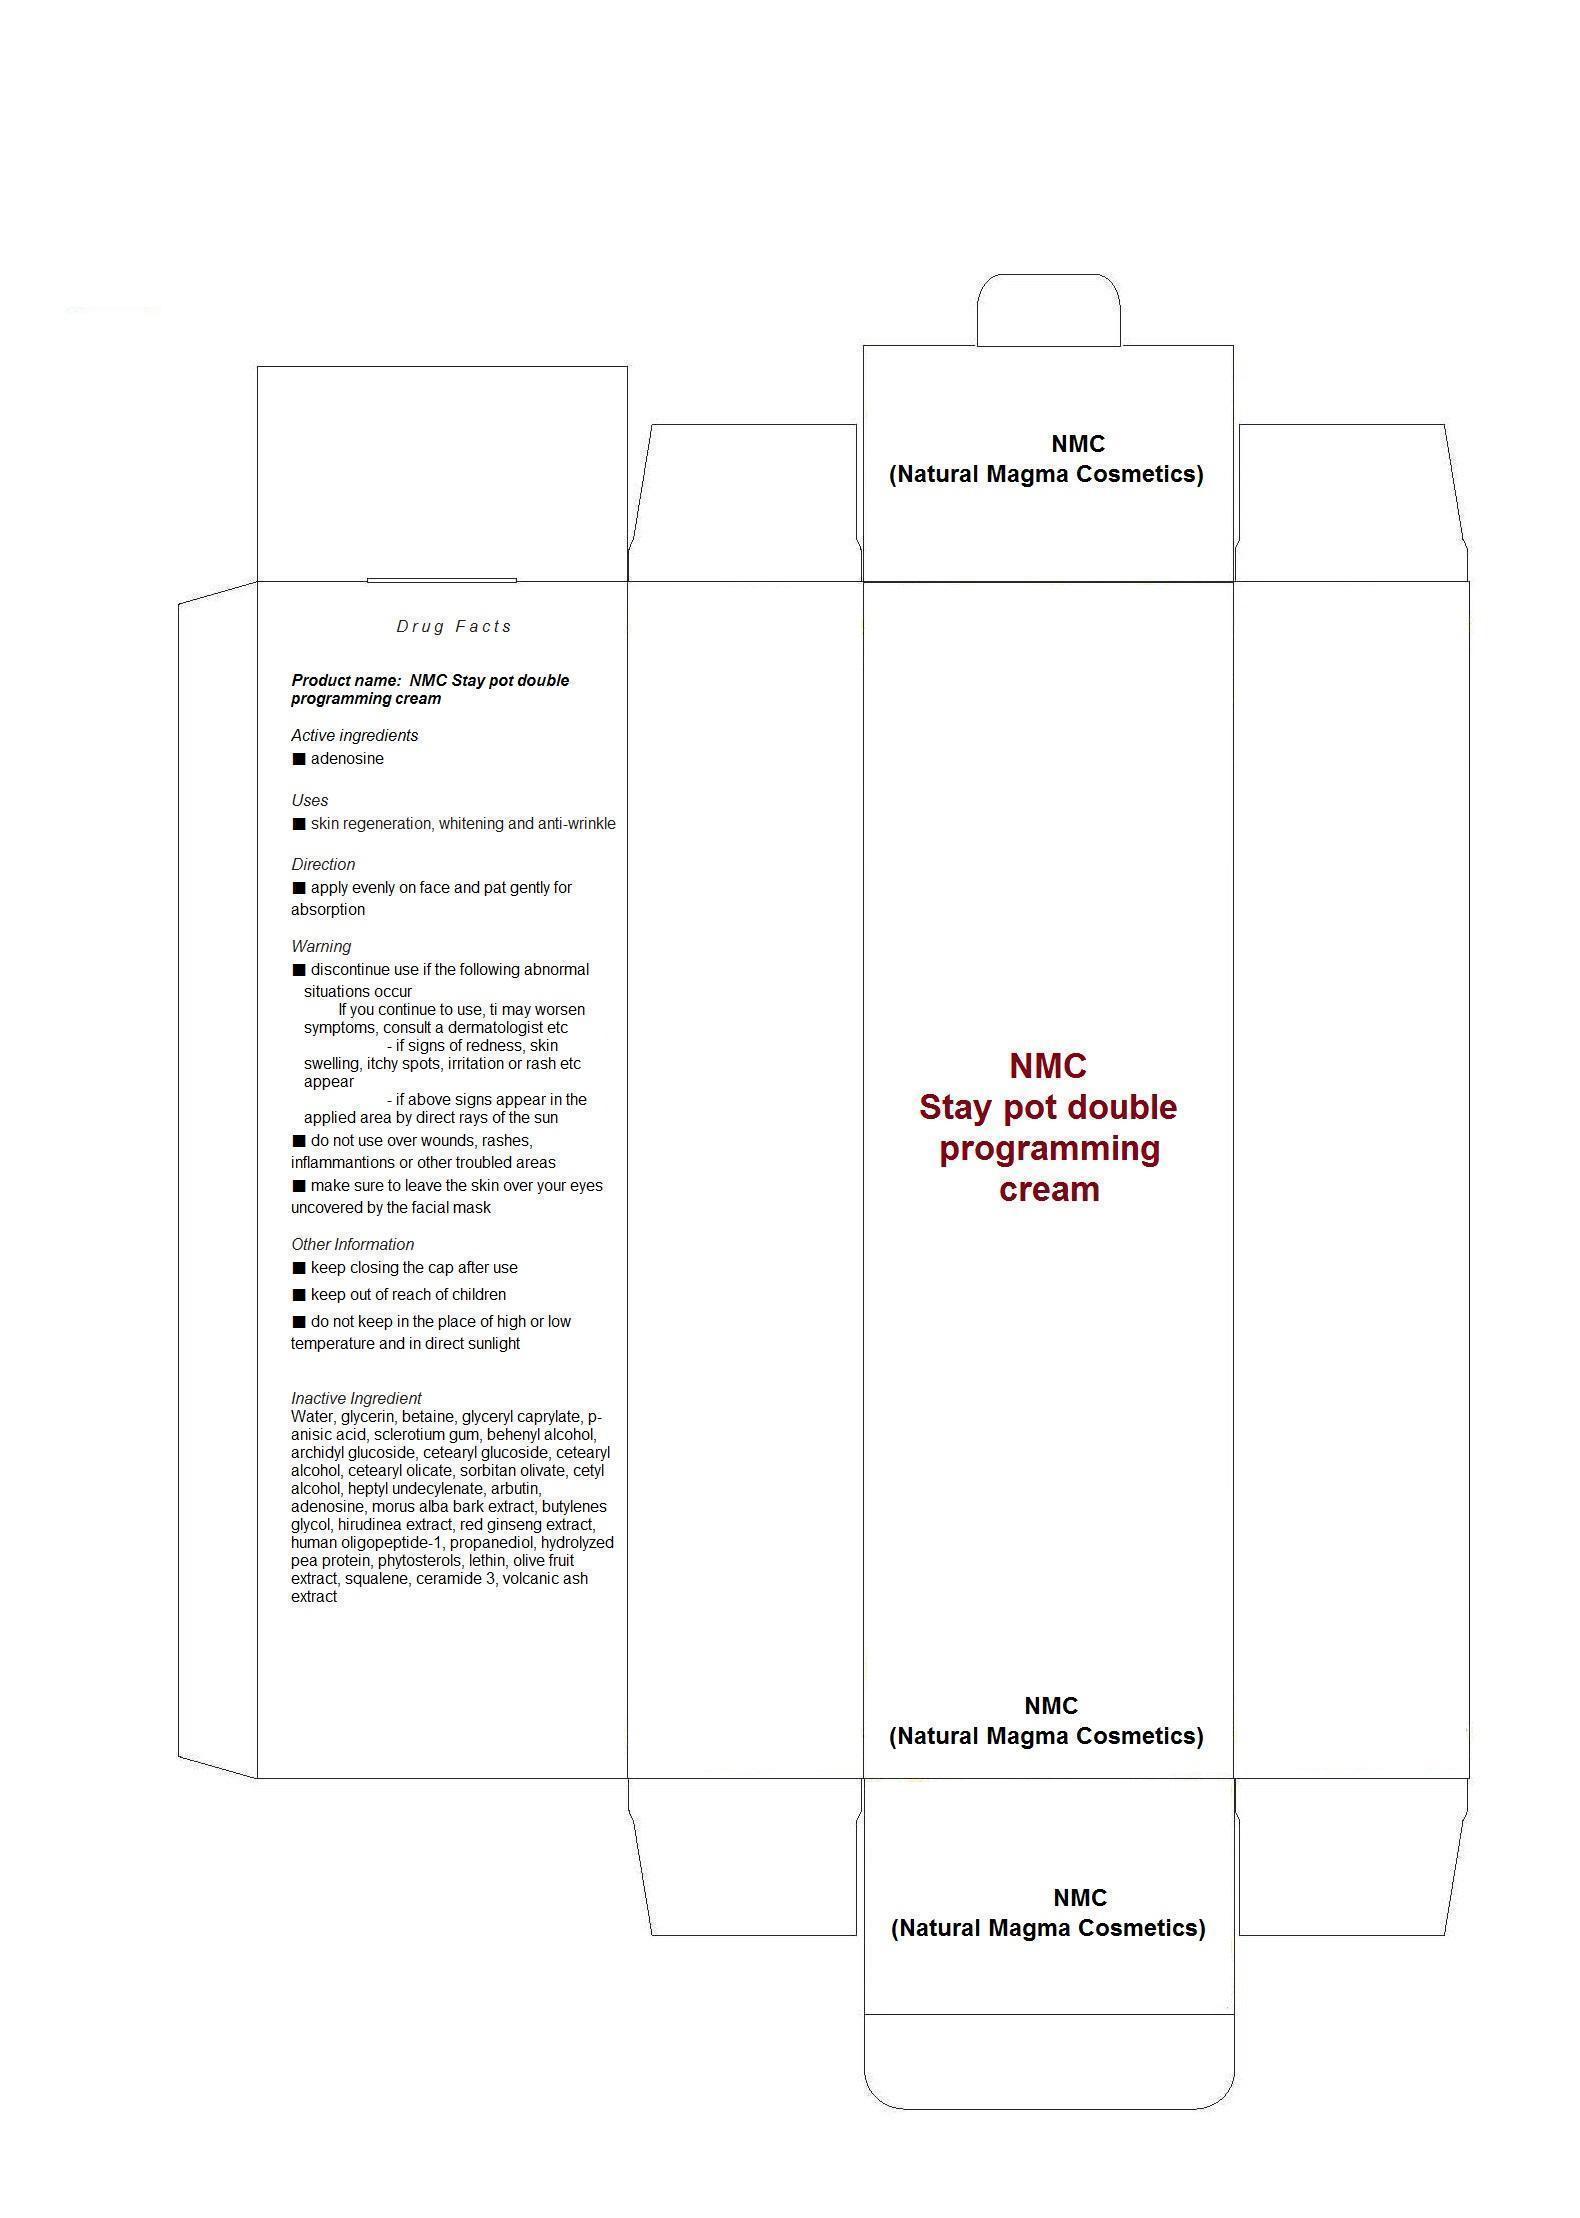 Nmc Staypot Double Programing Cream (Adenosine) Liquid [Nmc (Natural Magma Cosmetics)]